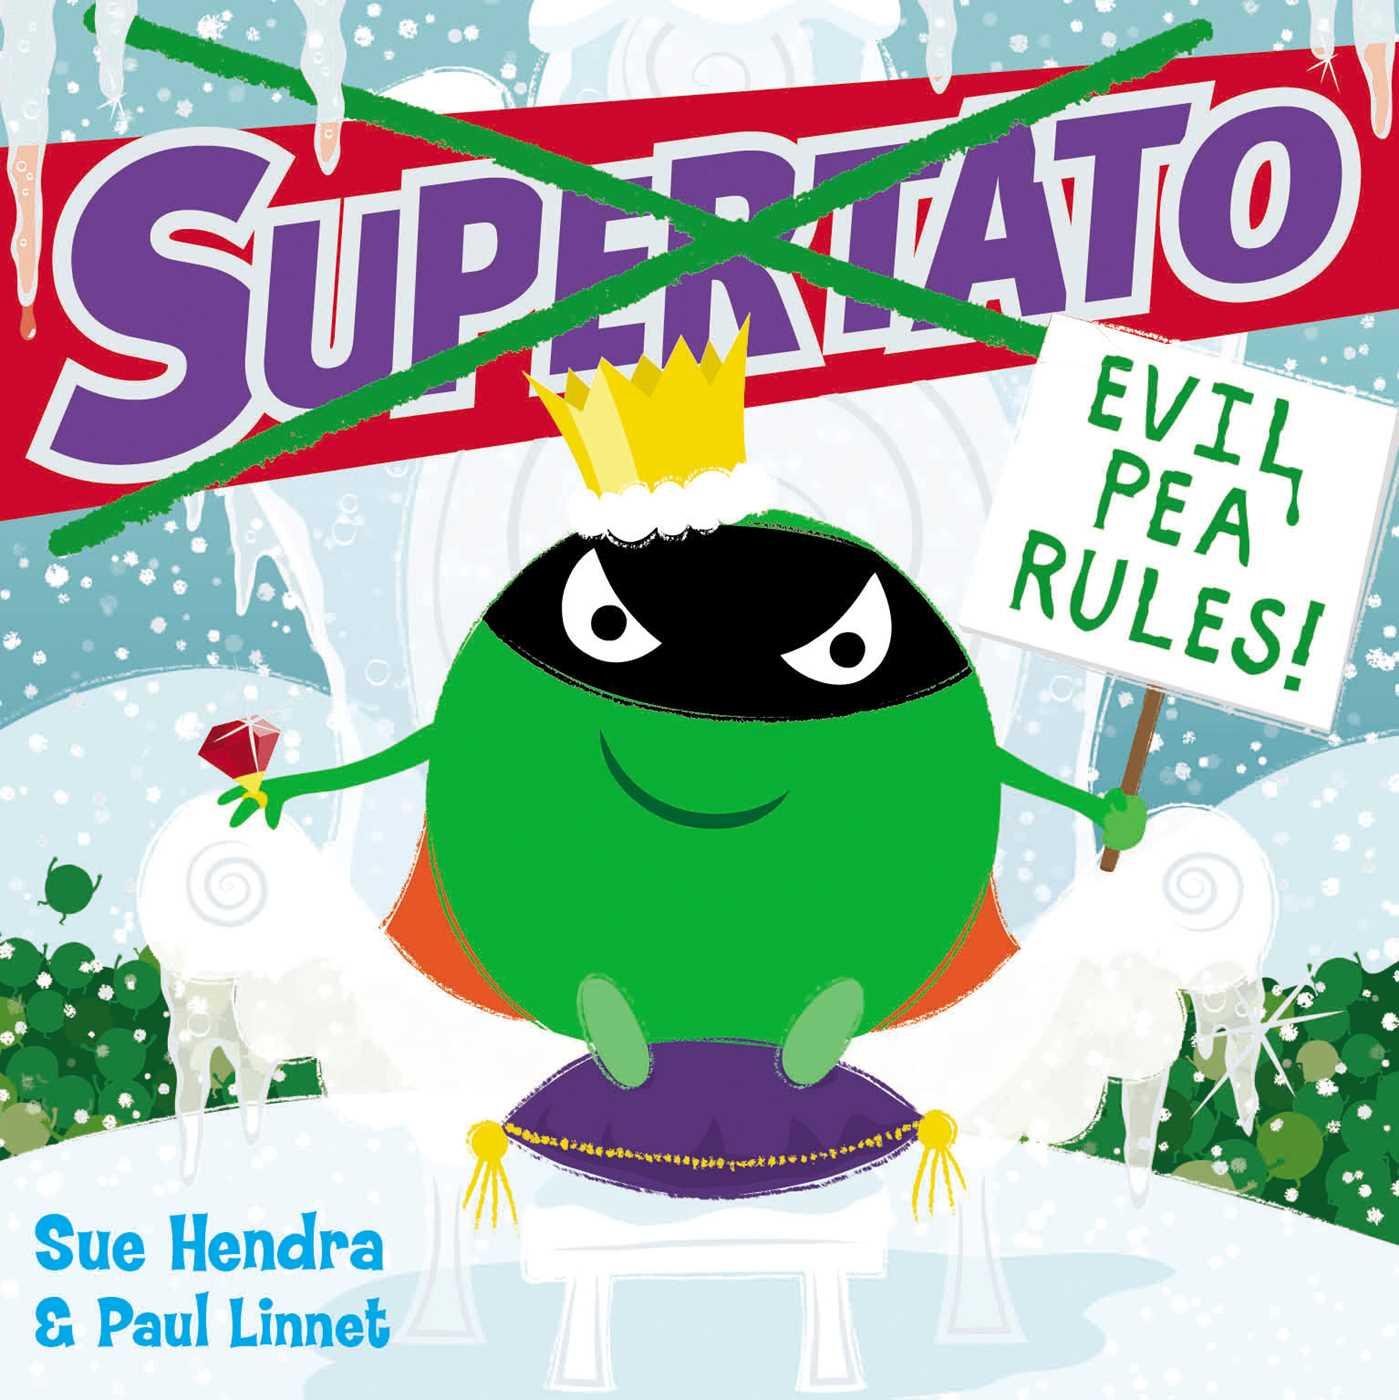 Supertato evil pea rules 9781471144066 hr